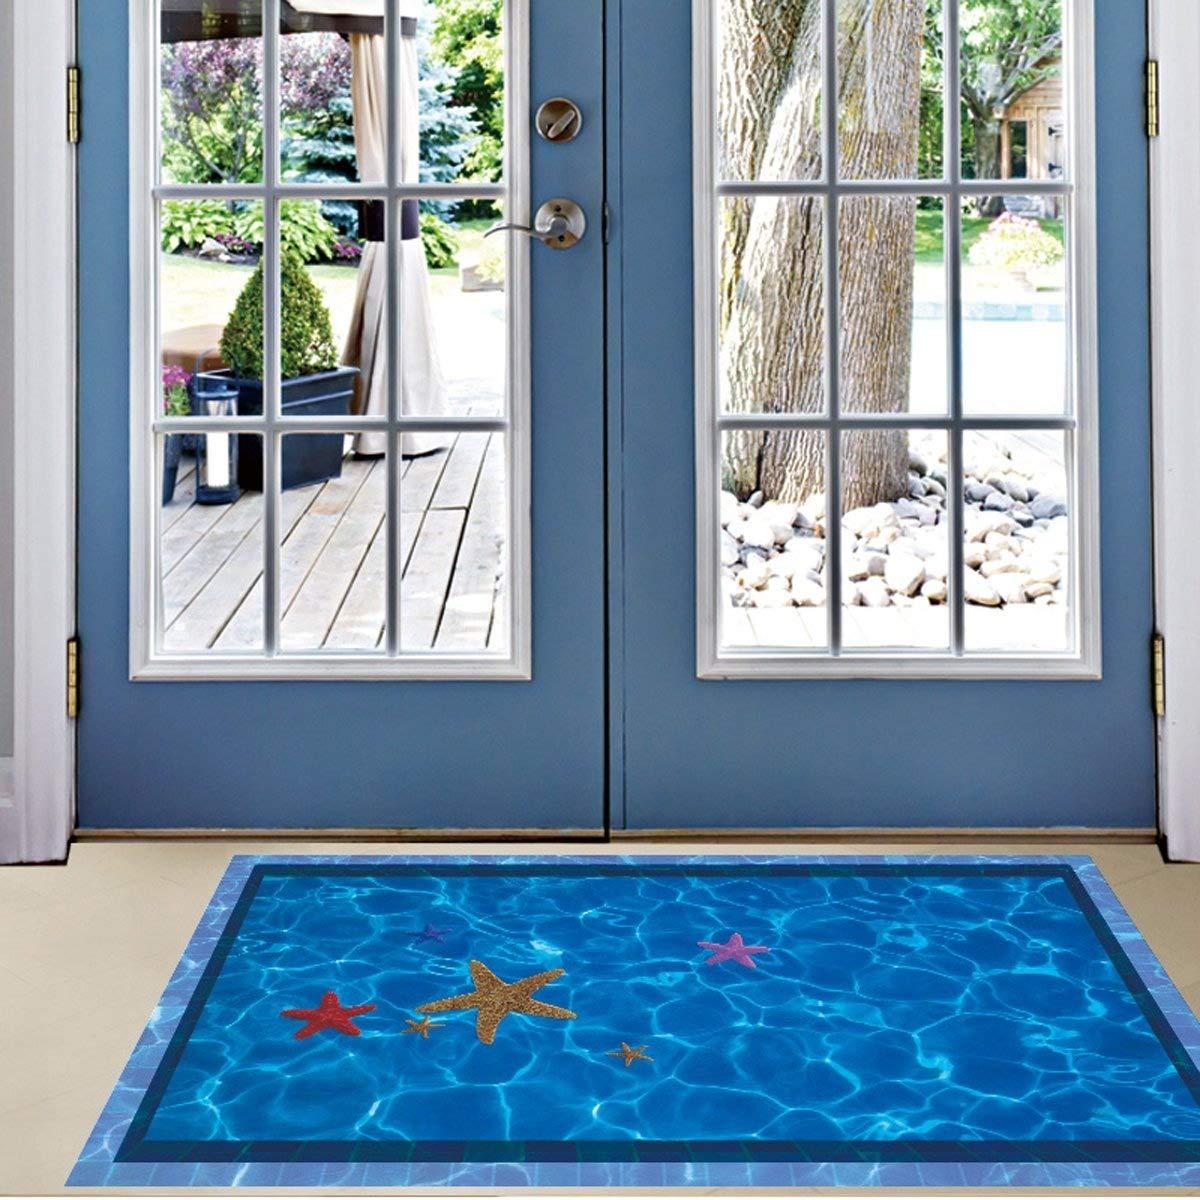 Amazon.com : iwallsticker Removable Creative 3D Blue Floor ...